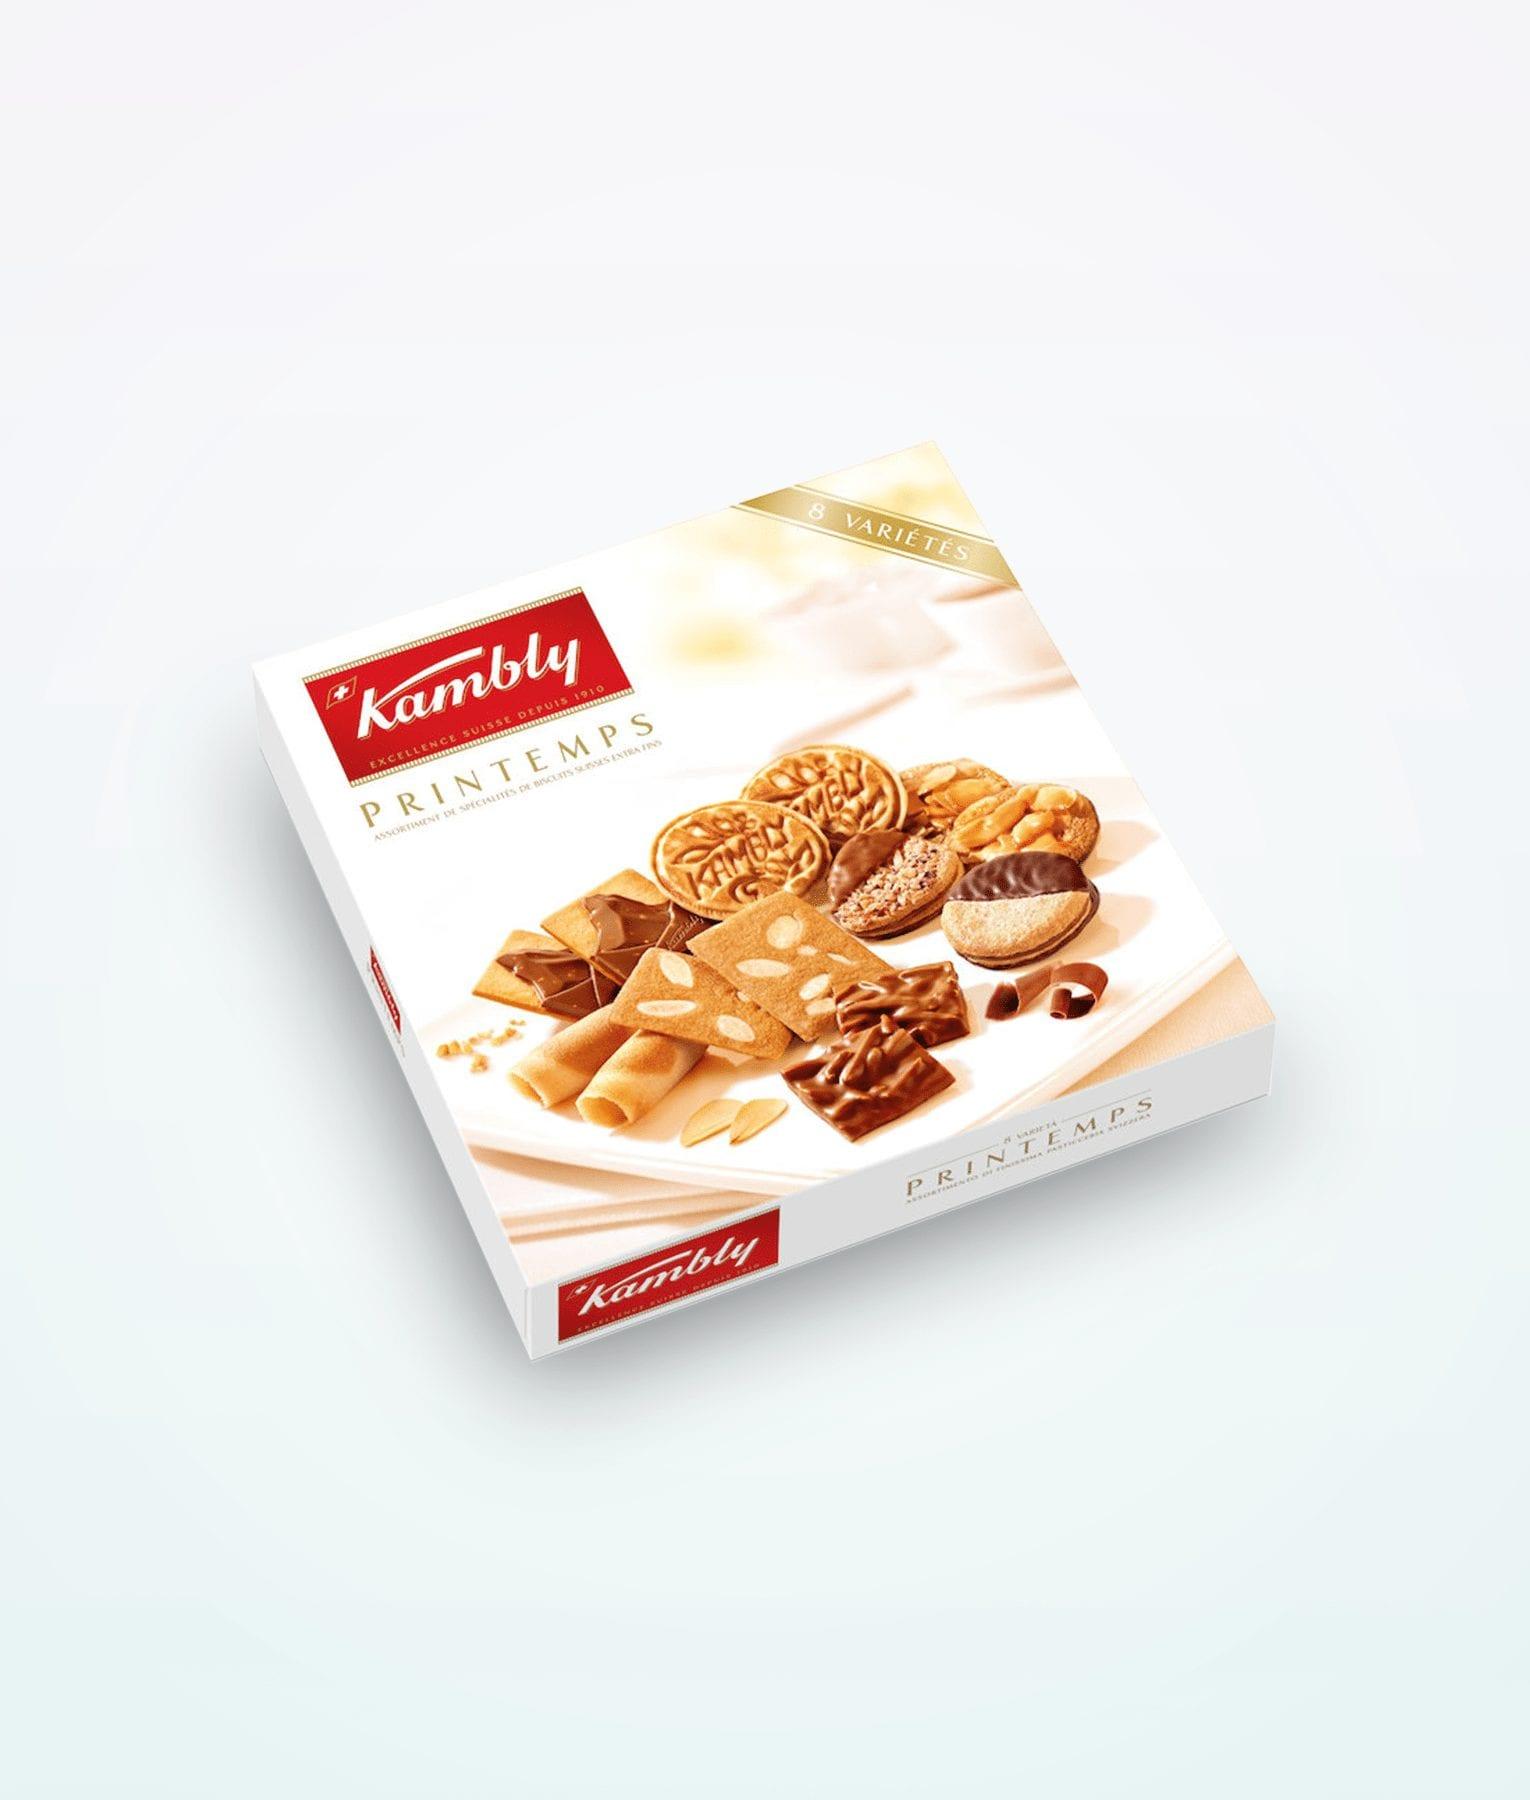 kambly-cookies-assorted-printemps-swissmade-direct